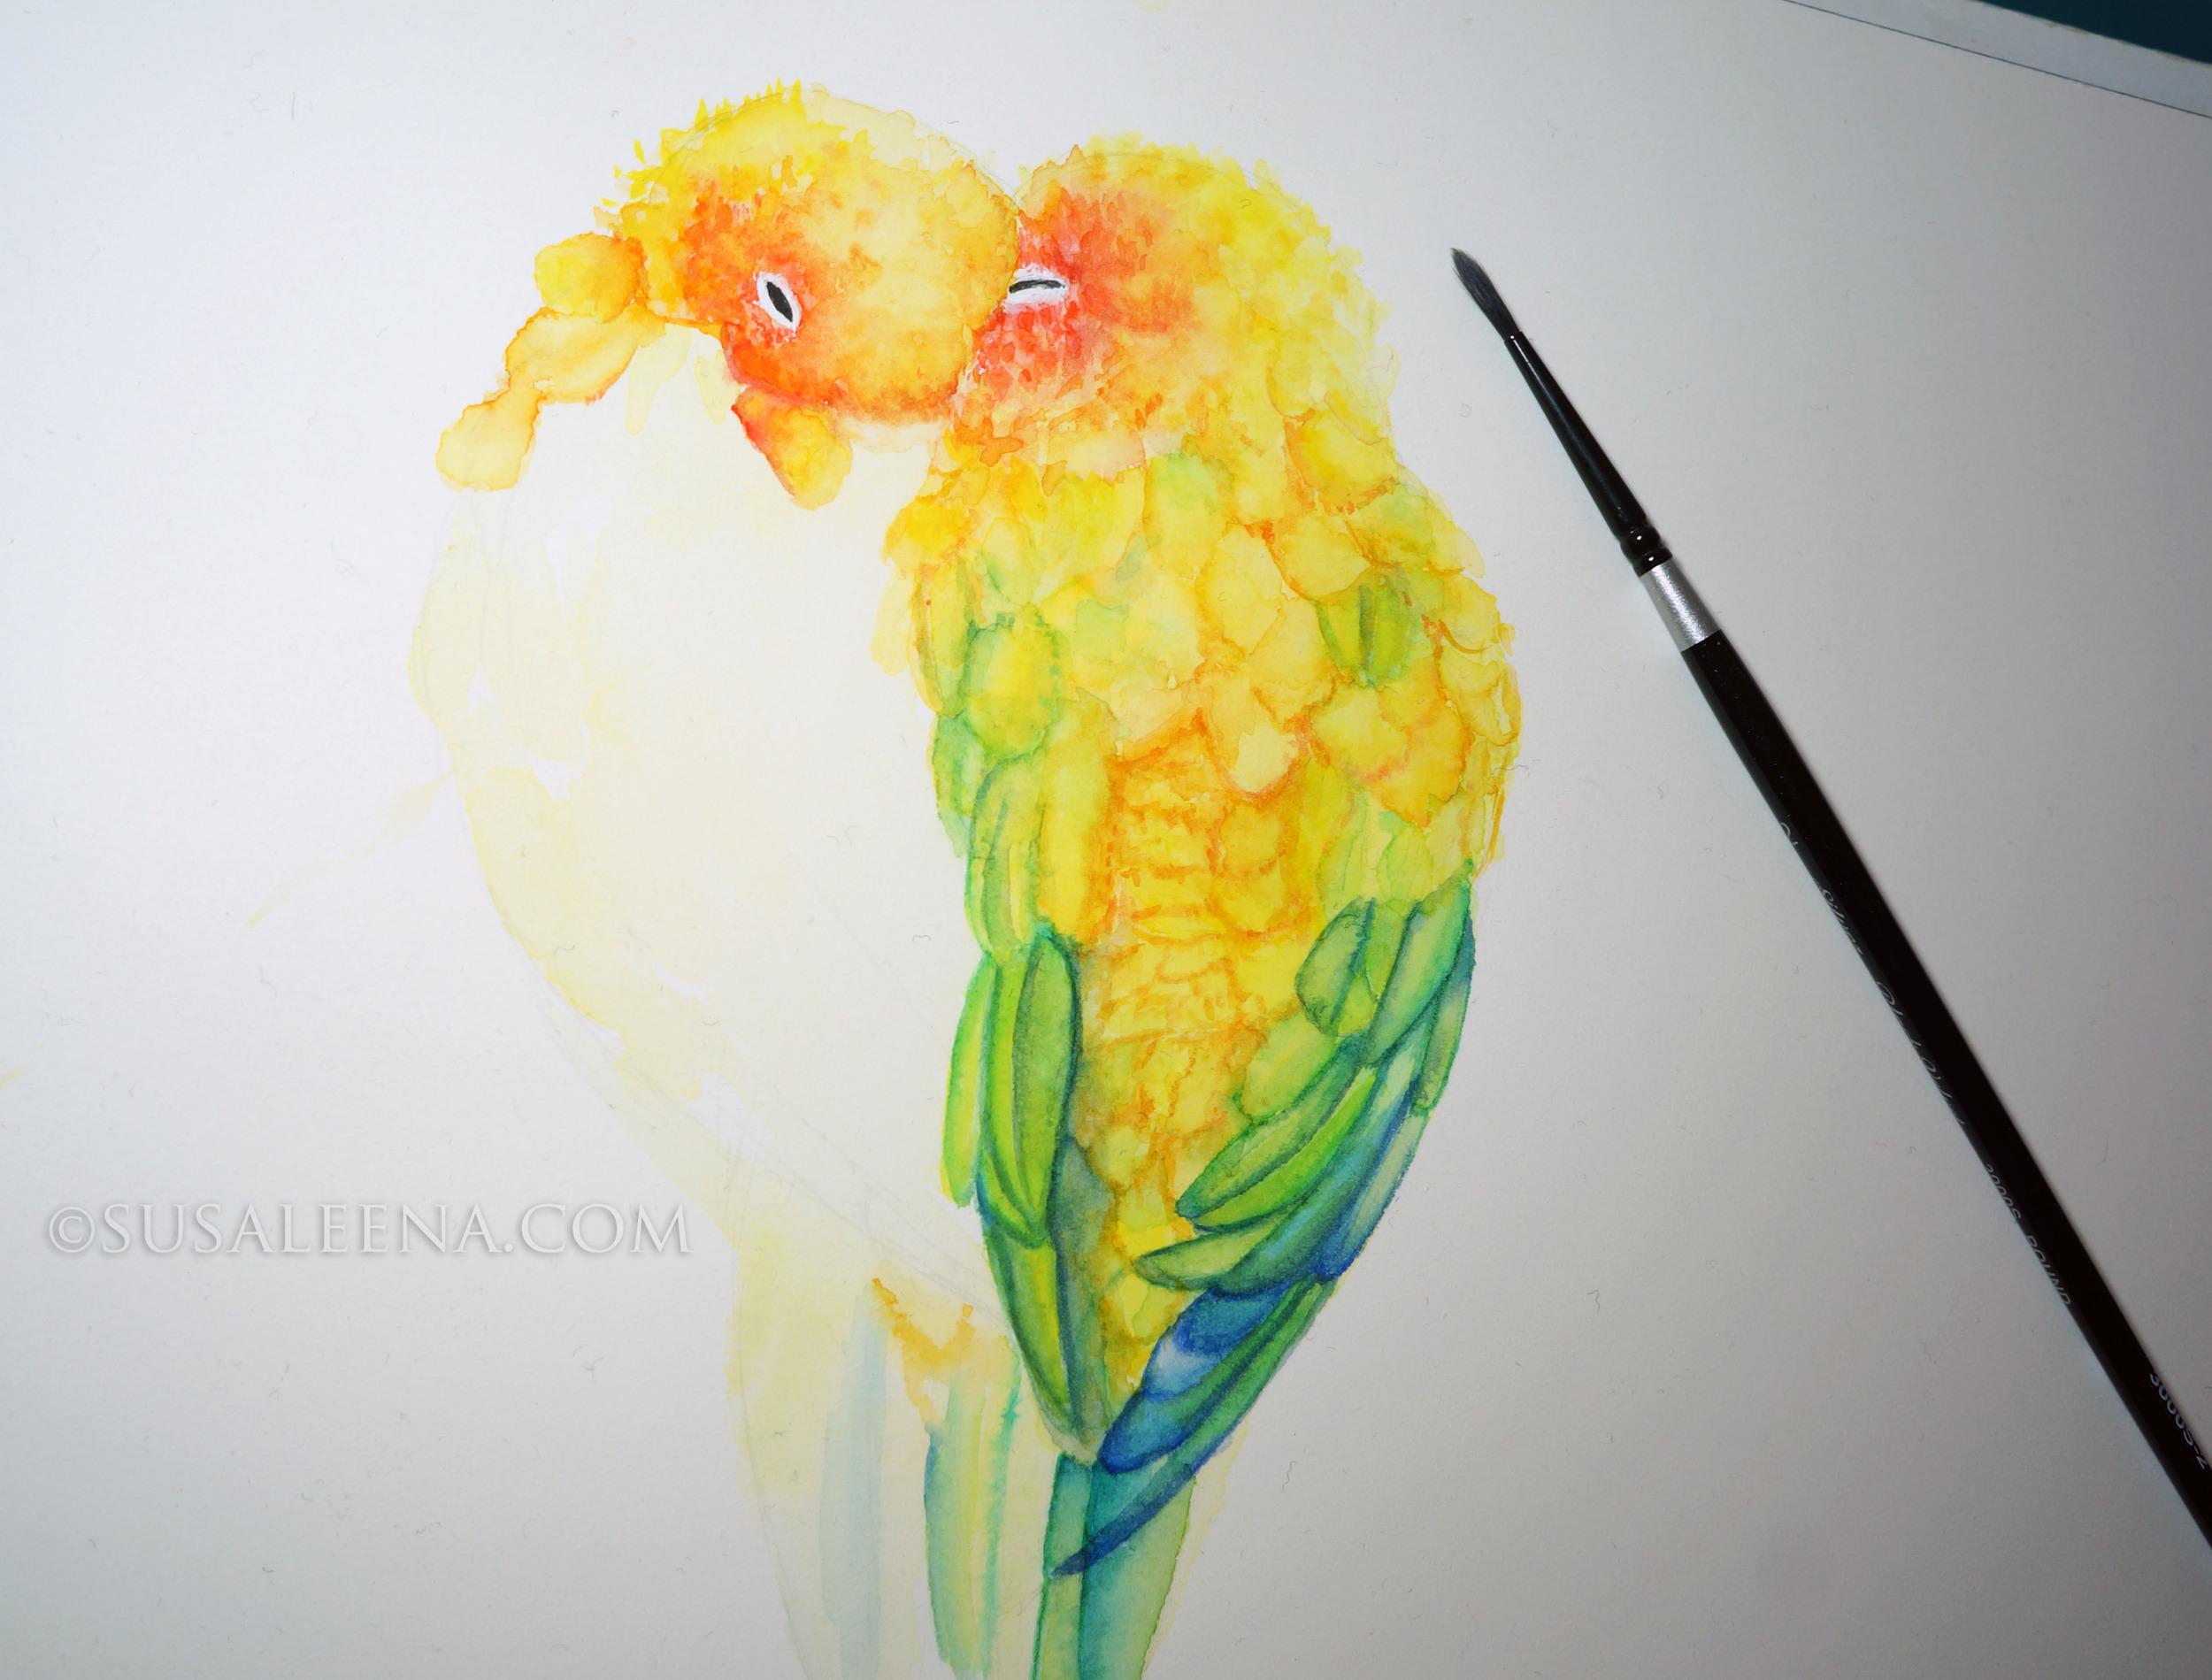 Lovebirds cuddling in the shape of a heart. Hope I finish soon!